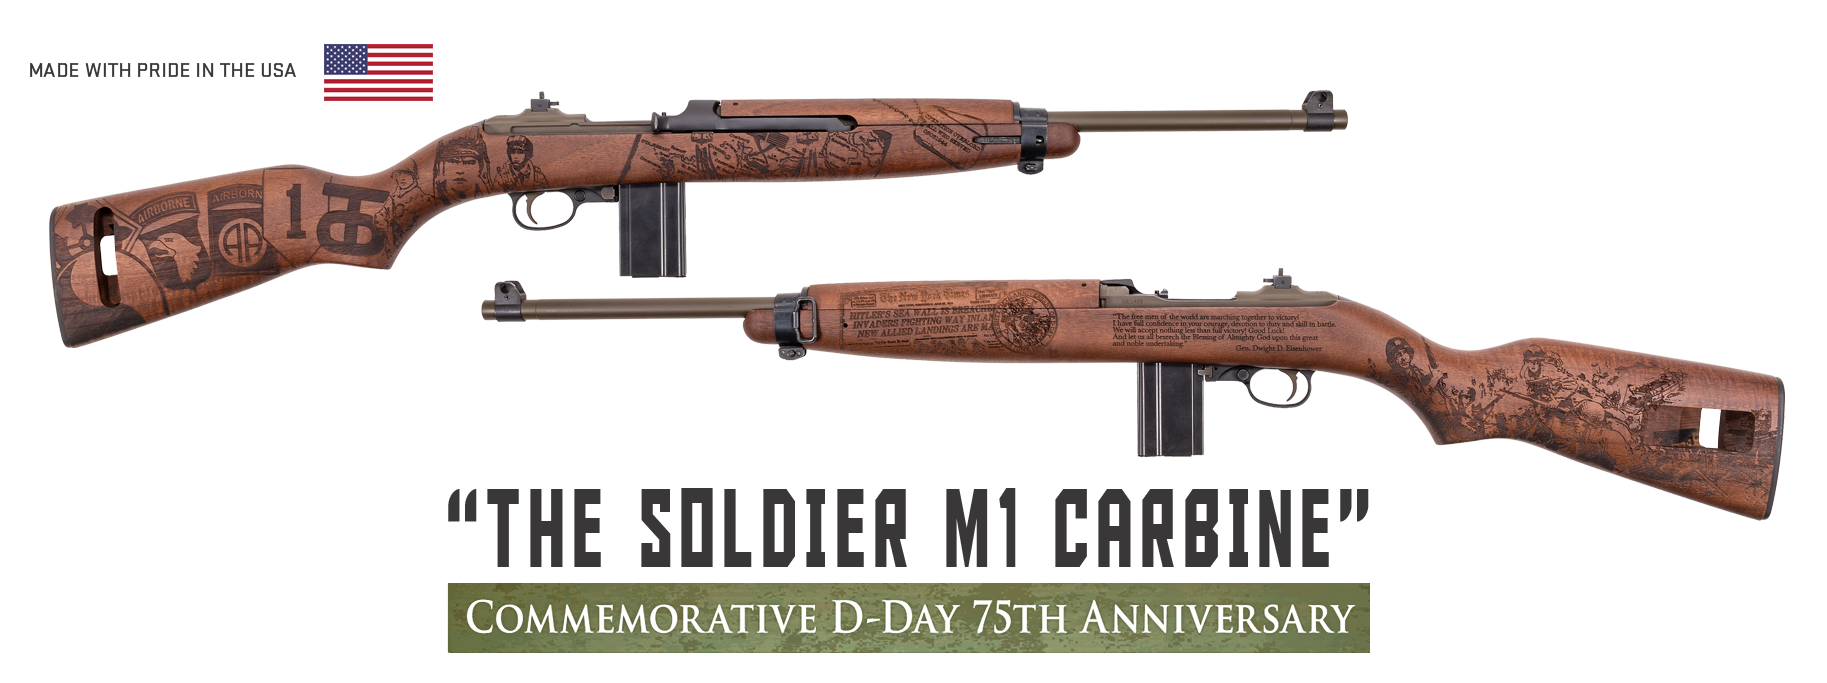 Soldier M1 Carbine - Auto-Ordnance | Original manufacturer